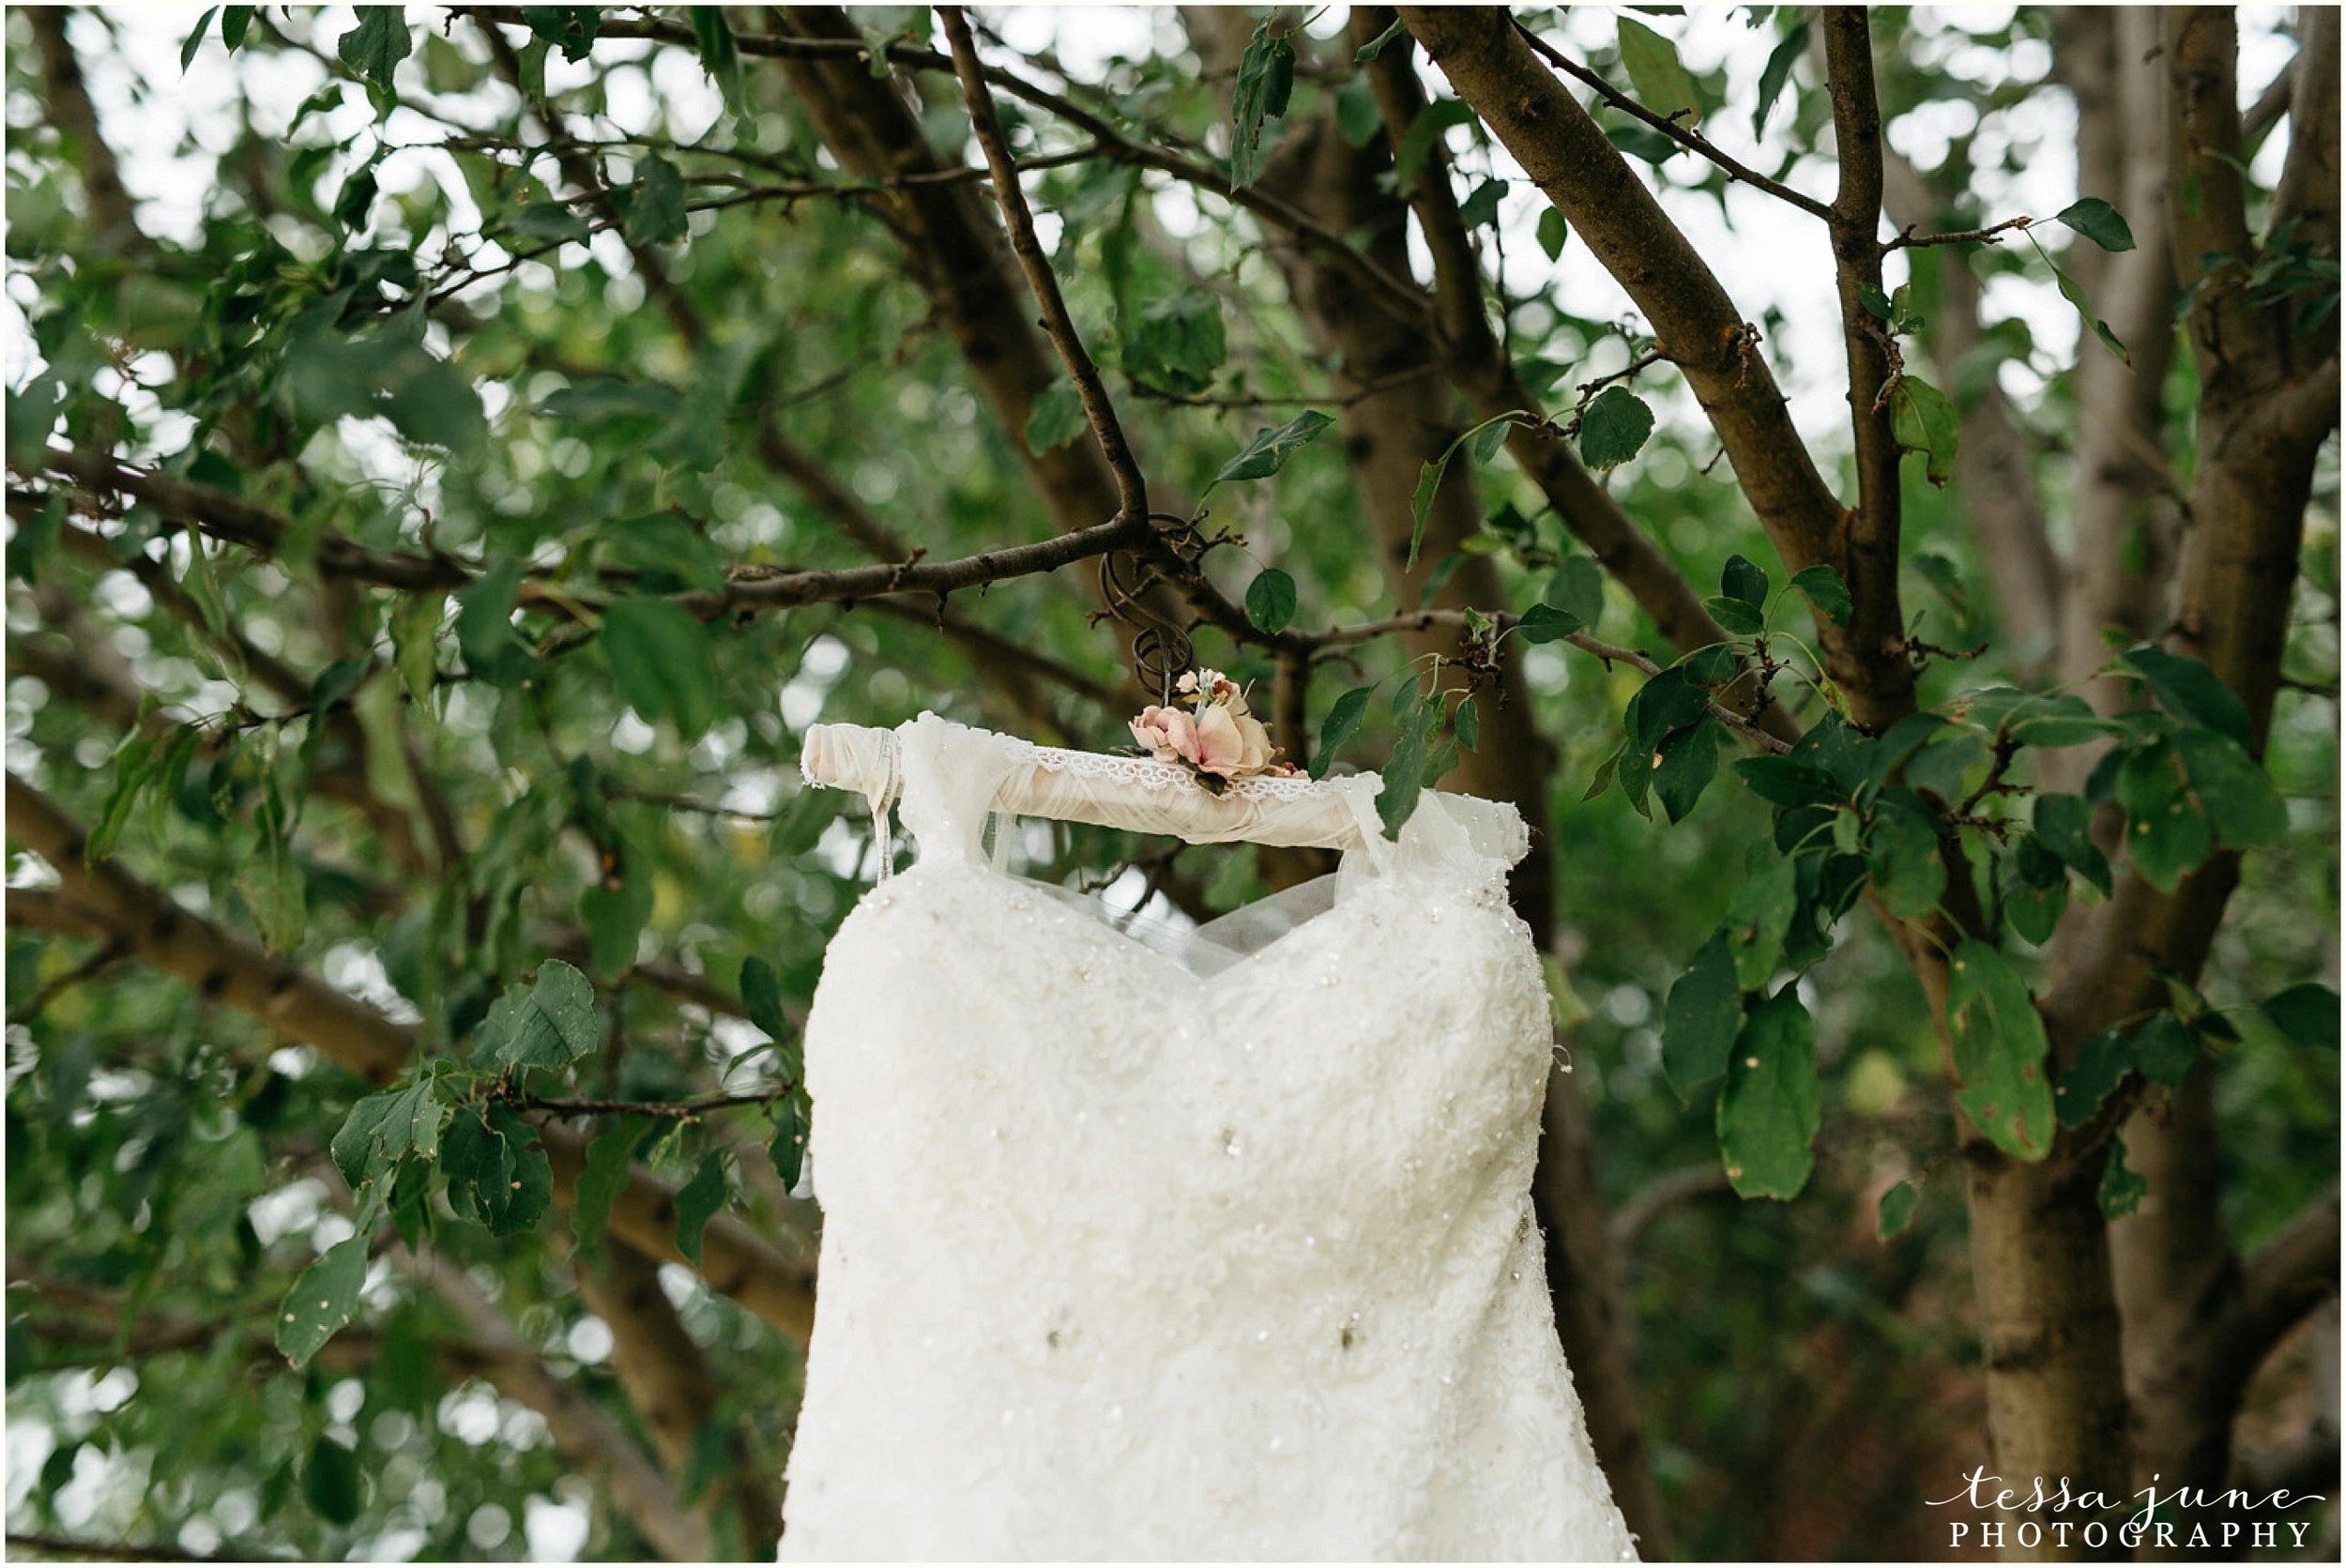 bohemian-minnesota-wedding-mismatched-bridesmaid-dresses-waterfall-st-cloud-tessa-june-photography-1.jpg